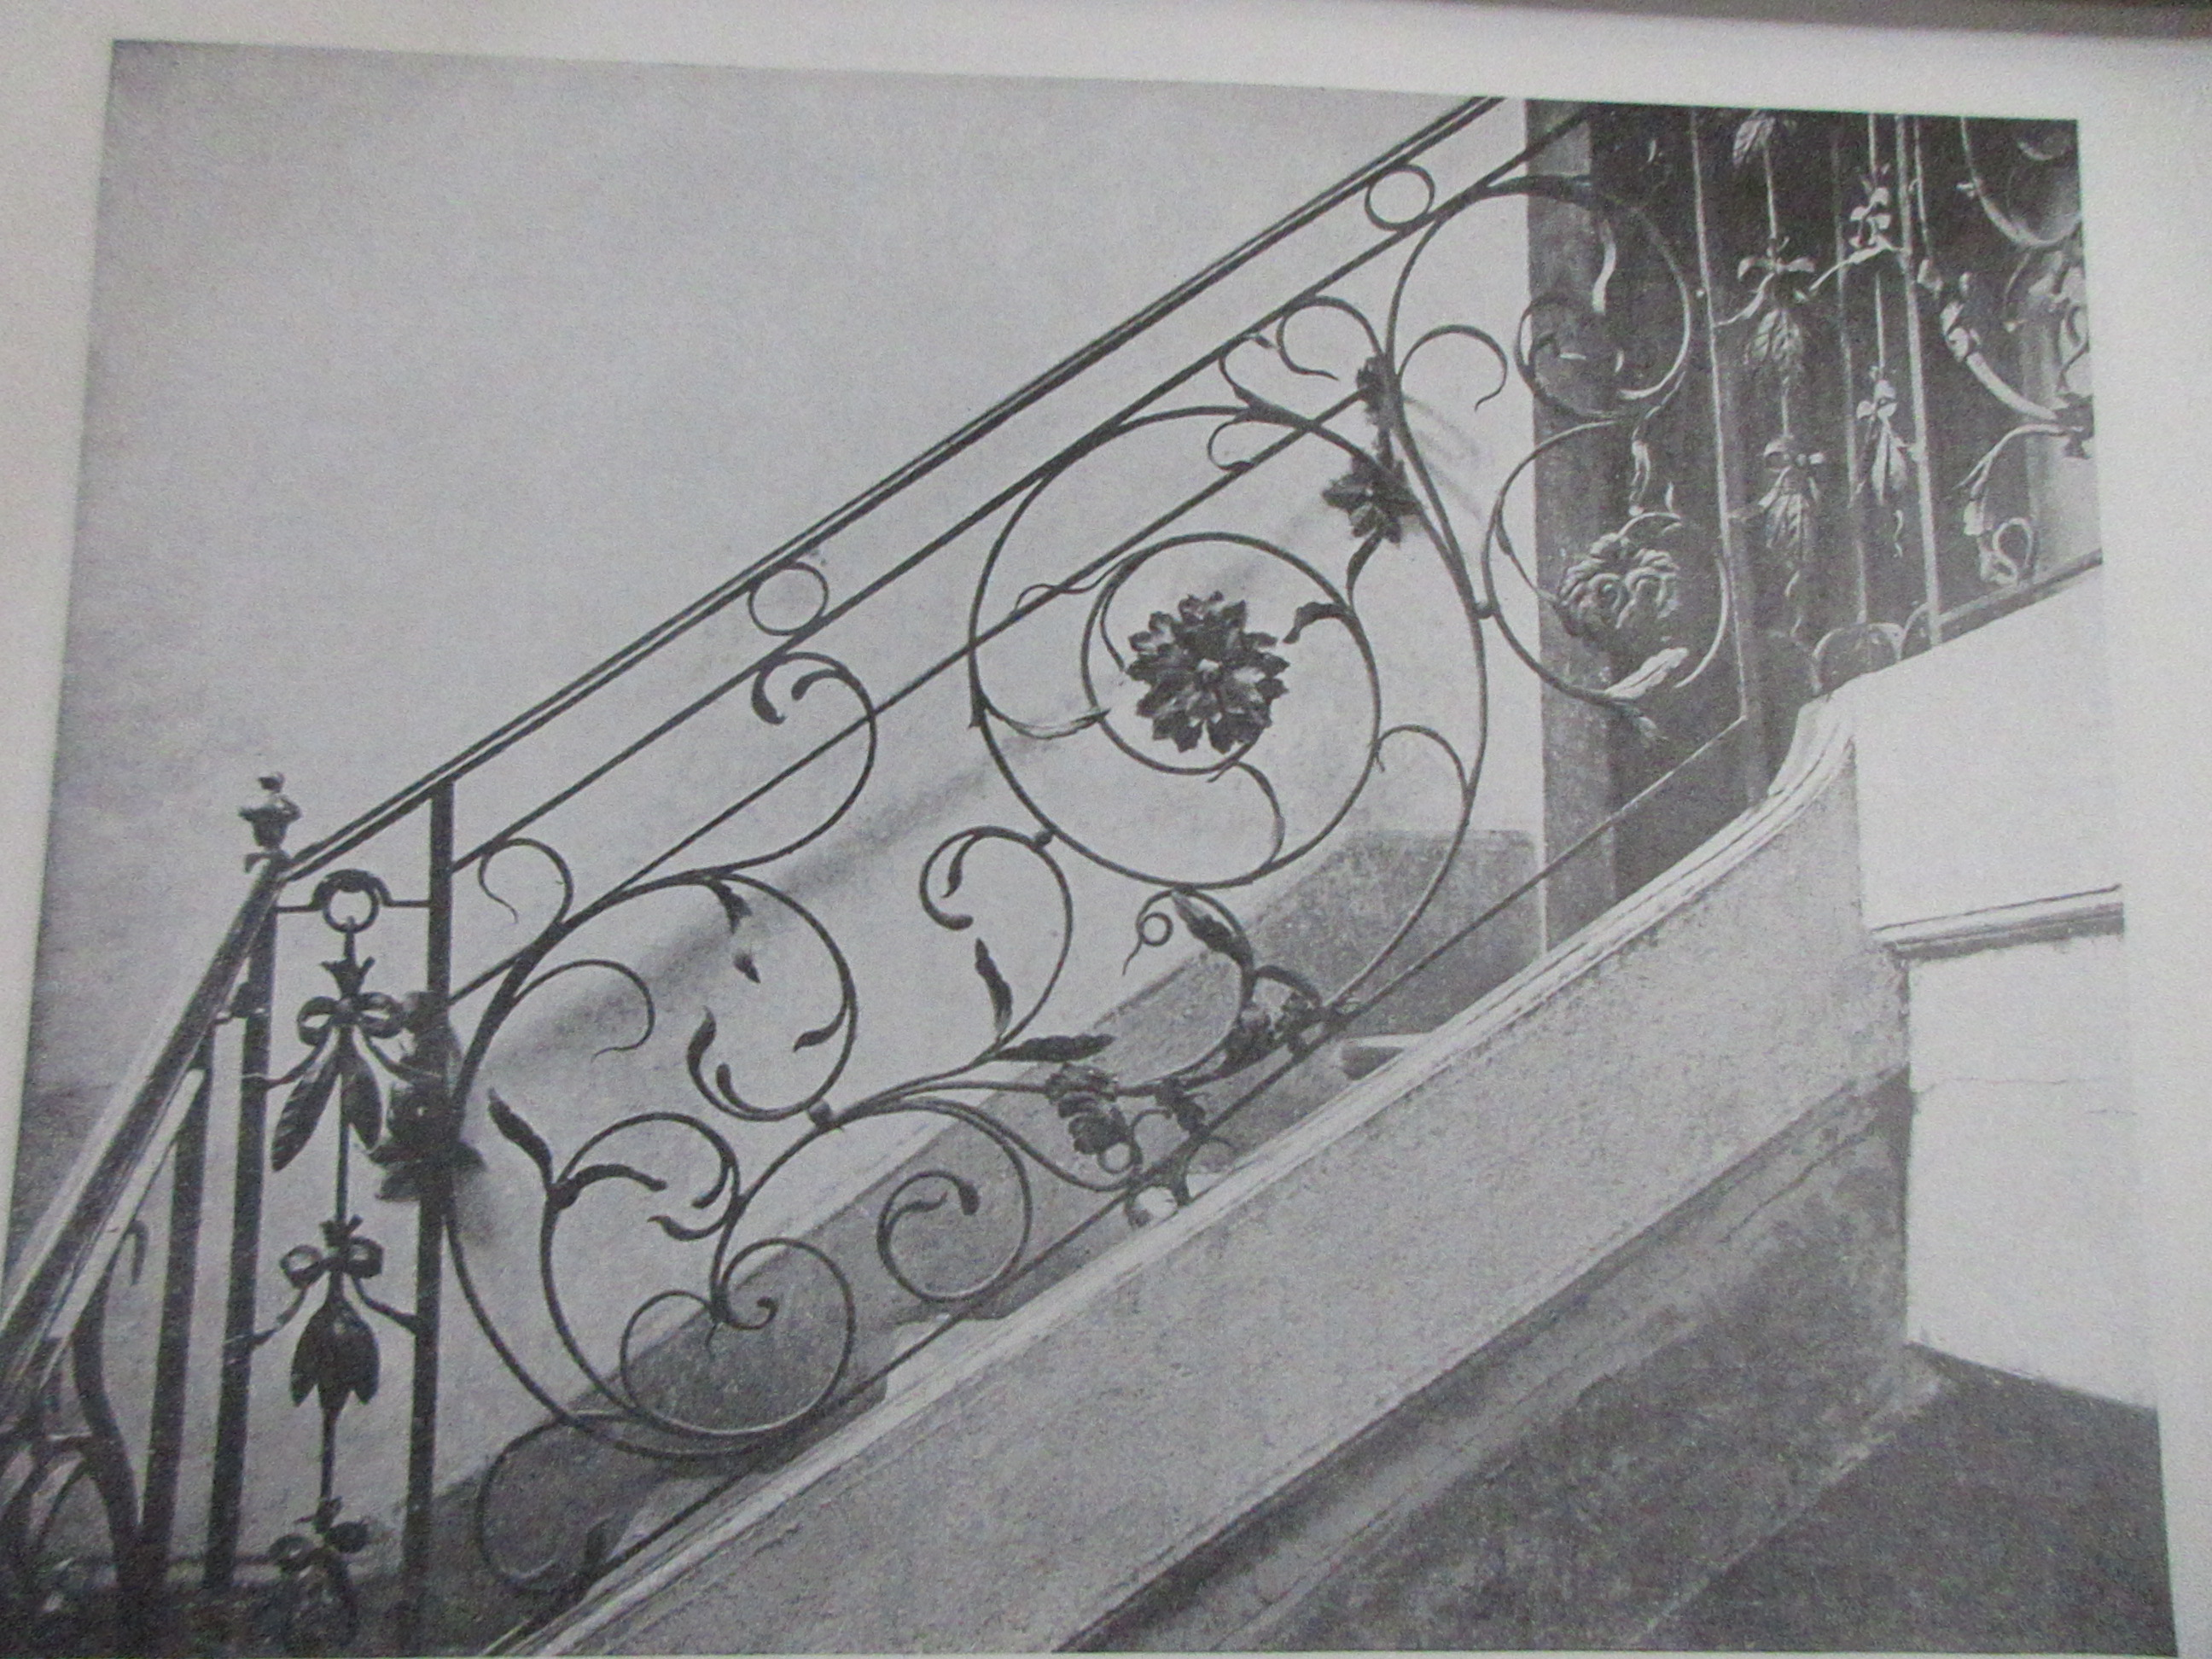 Hench 19 Century Wrought Iron Stair Railing Wrought Iron   Wrought Iron Stair Railing   Diy   Staircase   Simple   Silver   Horizontal